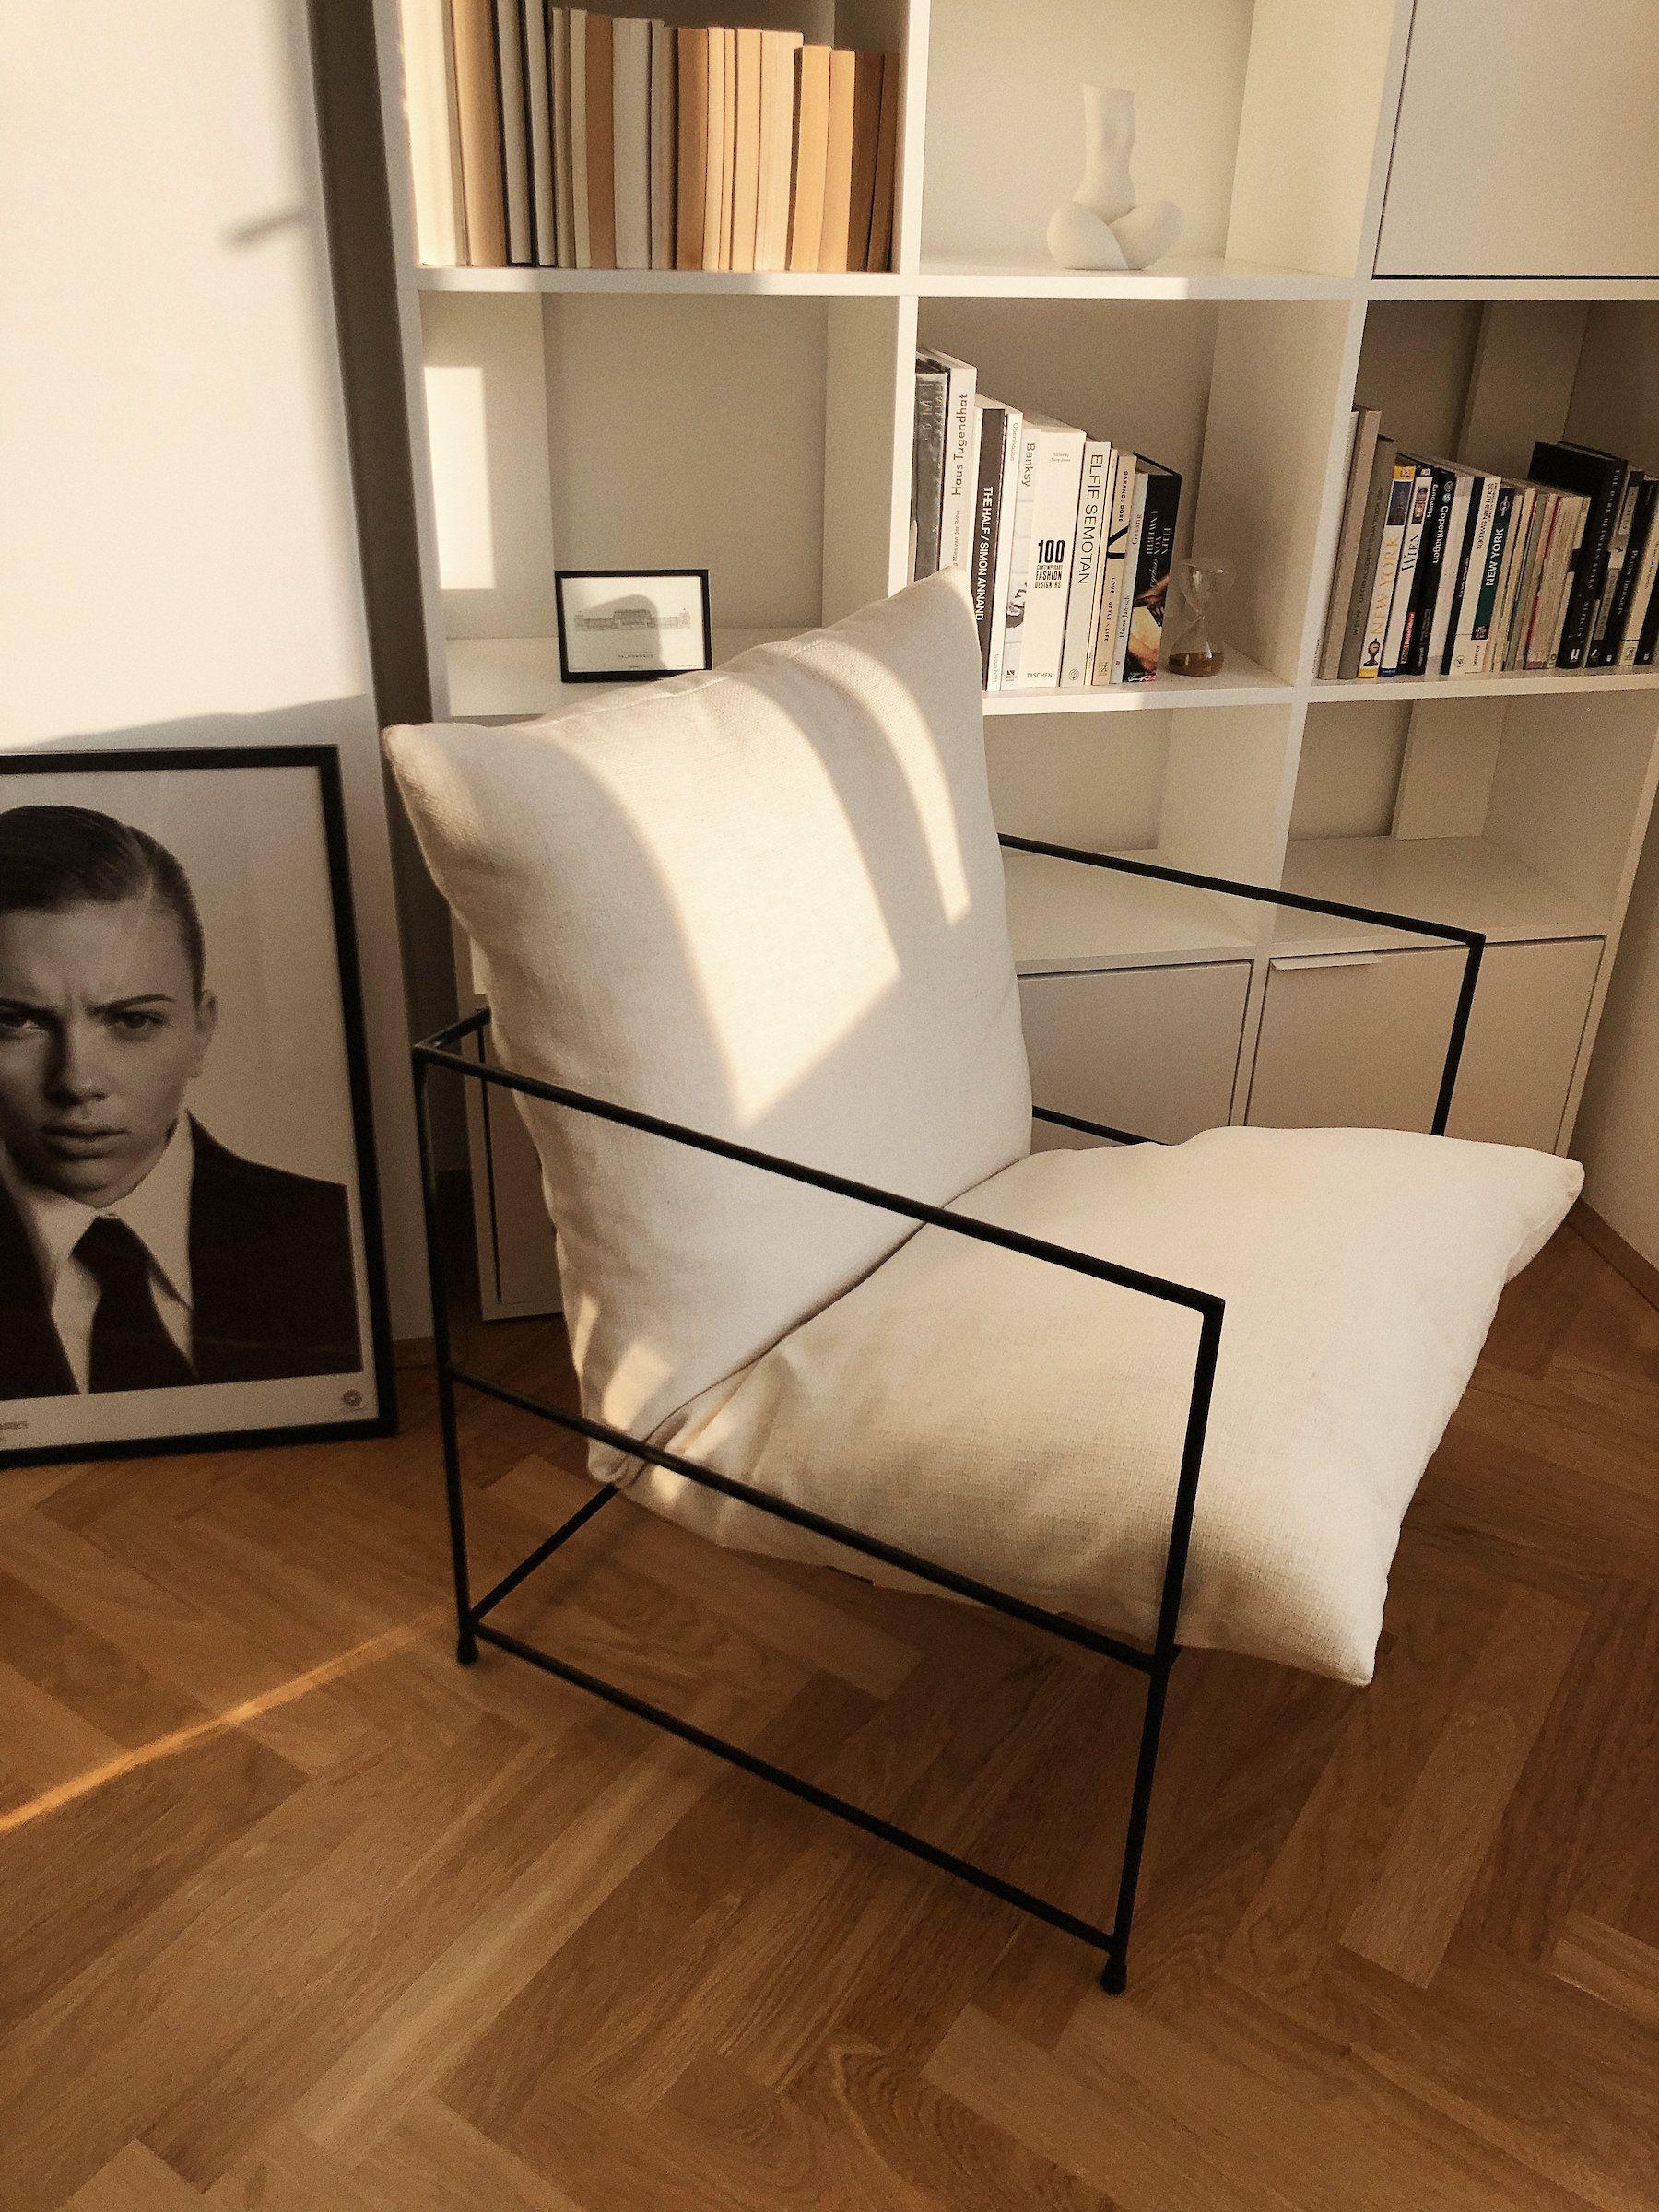 10 Best Interior Design, Furniture & Home Decor On